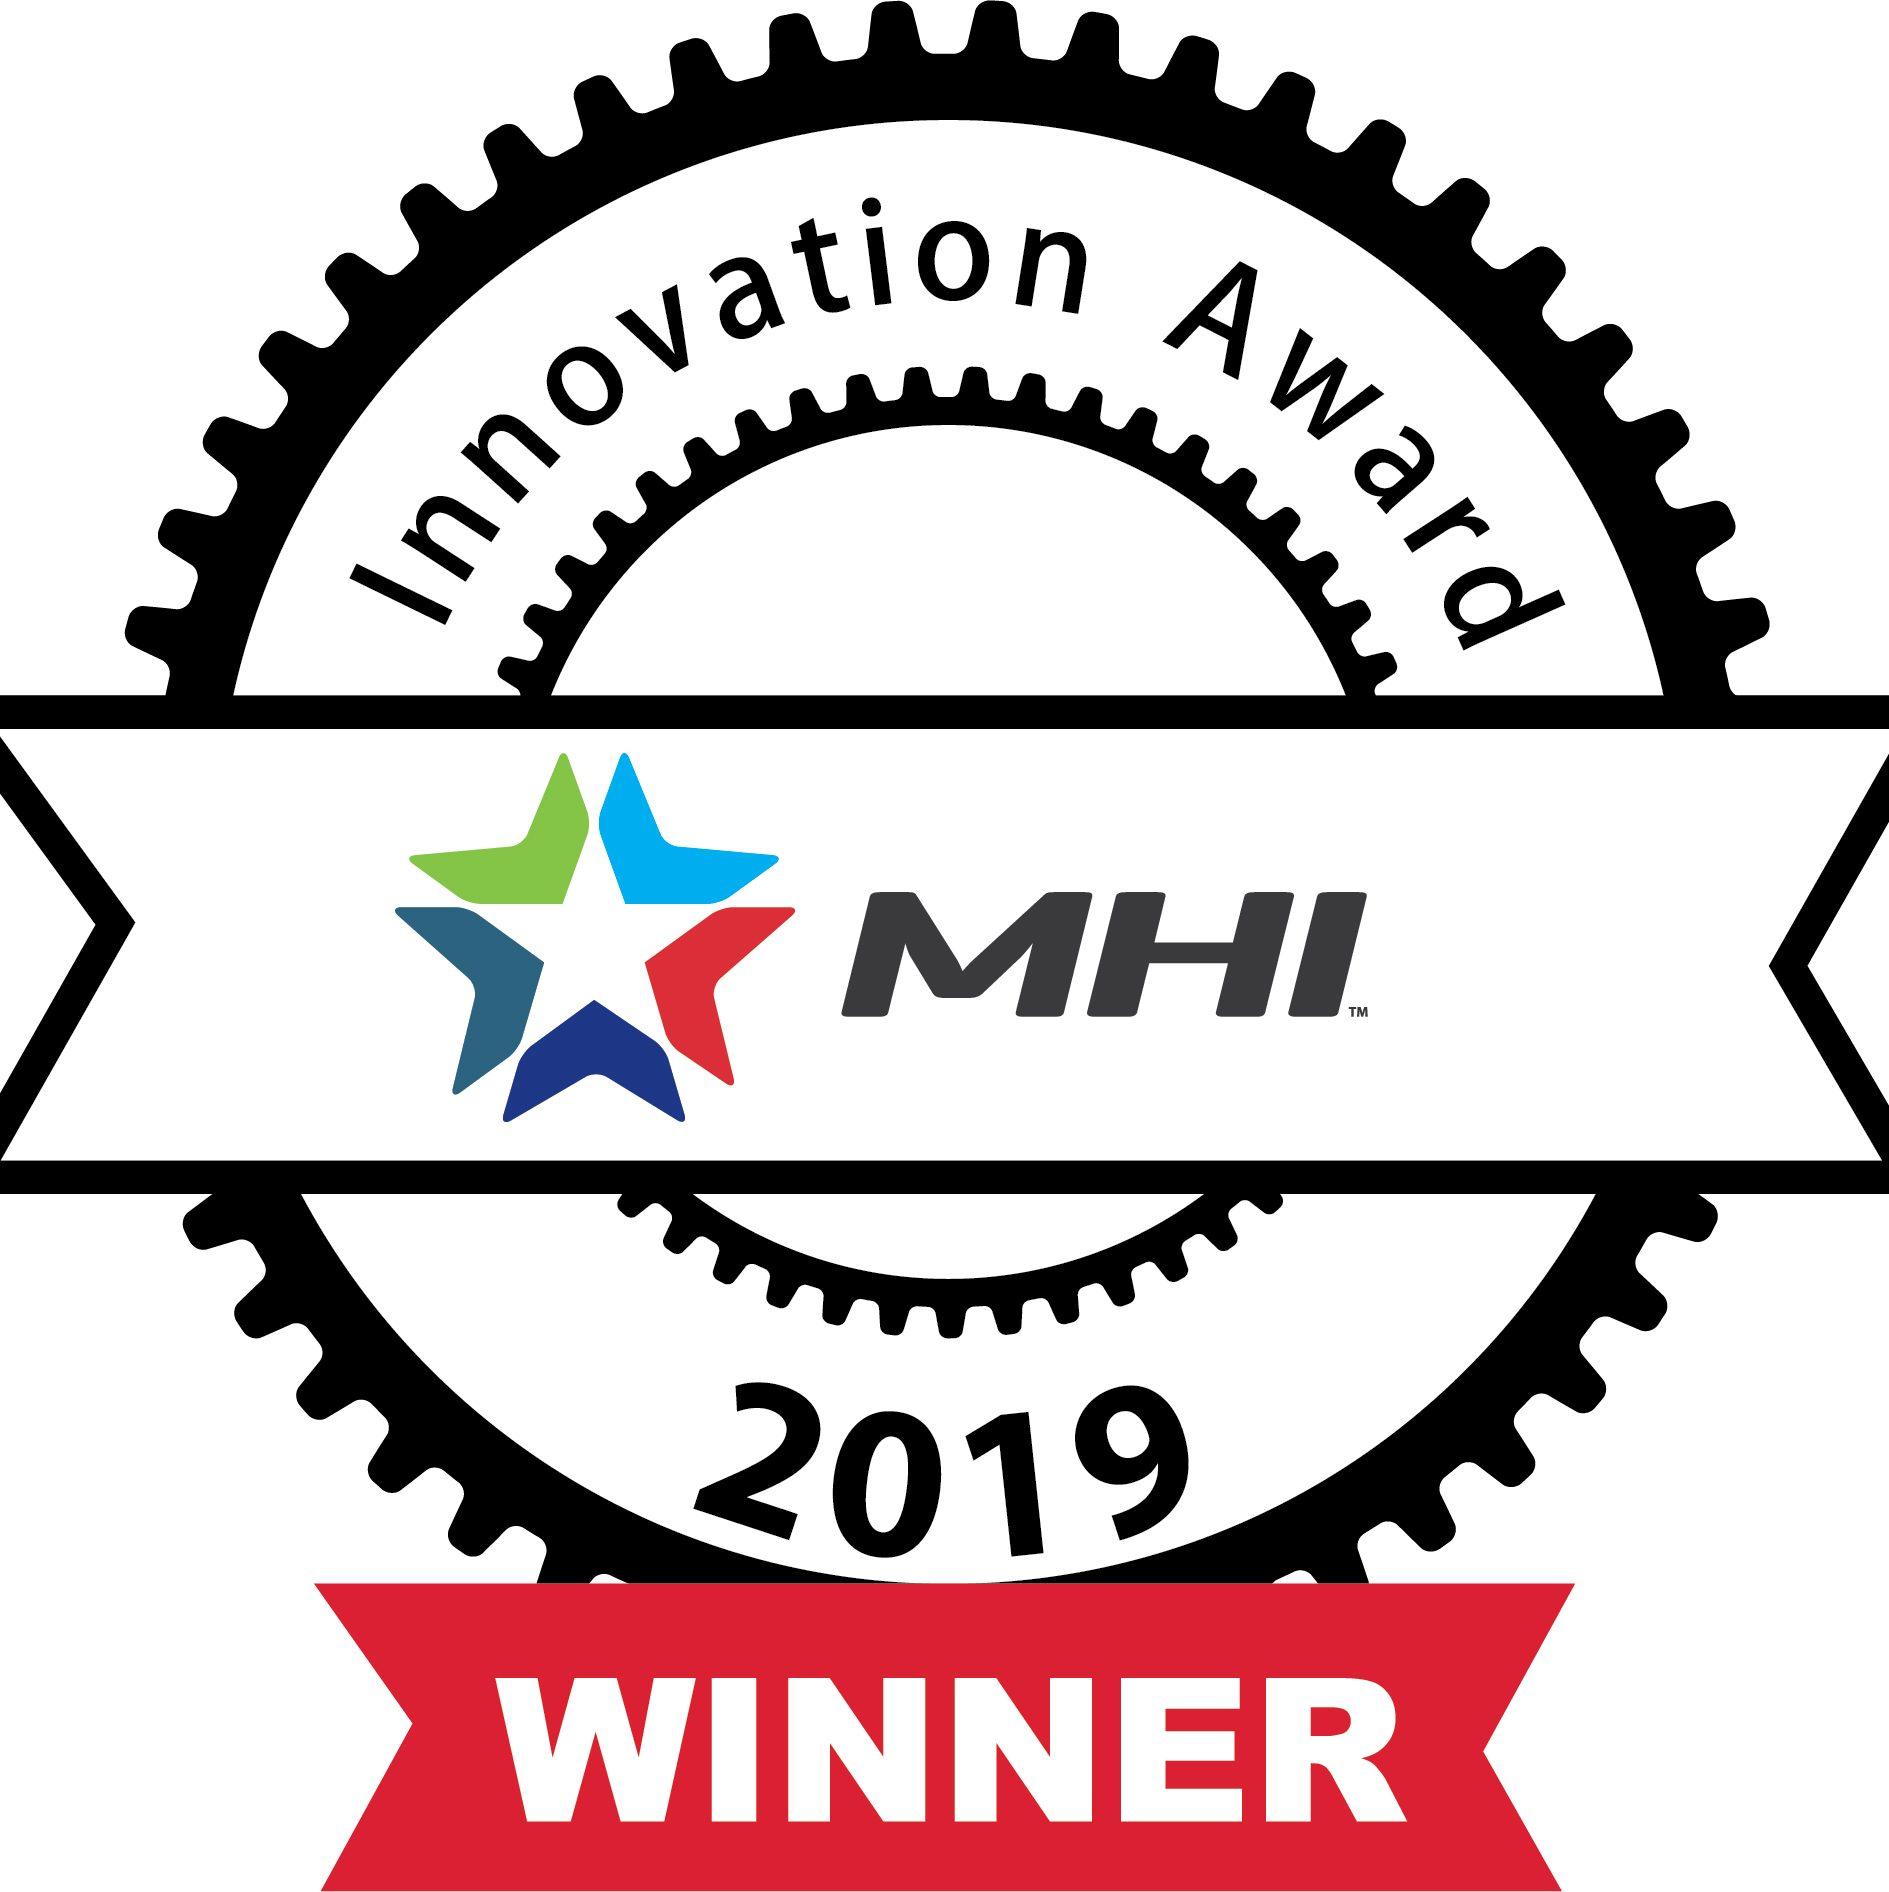 winner mhi award for most innovative software